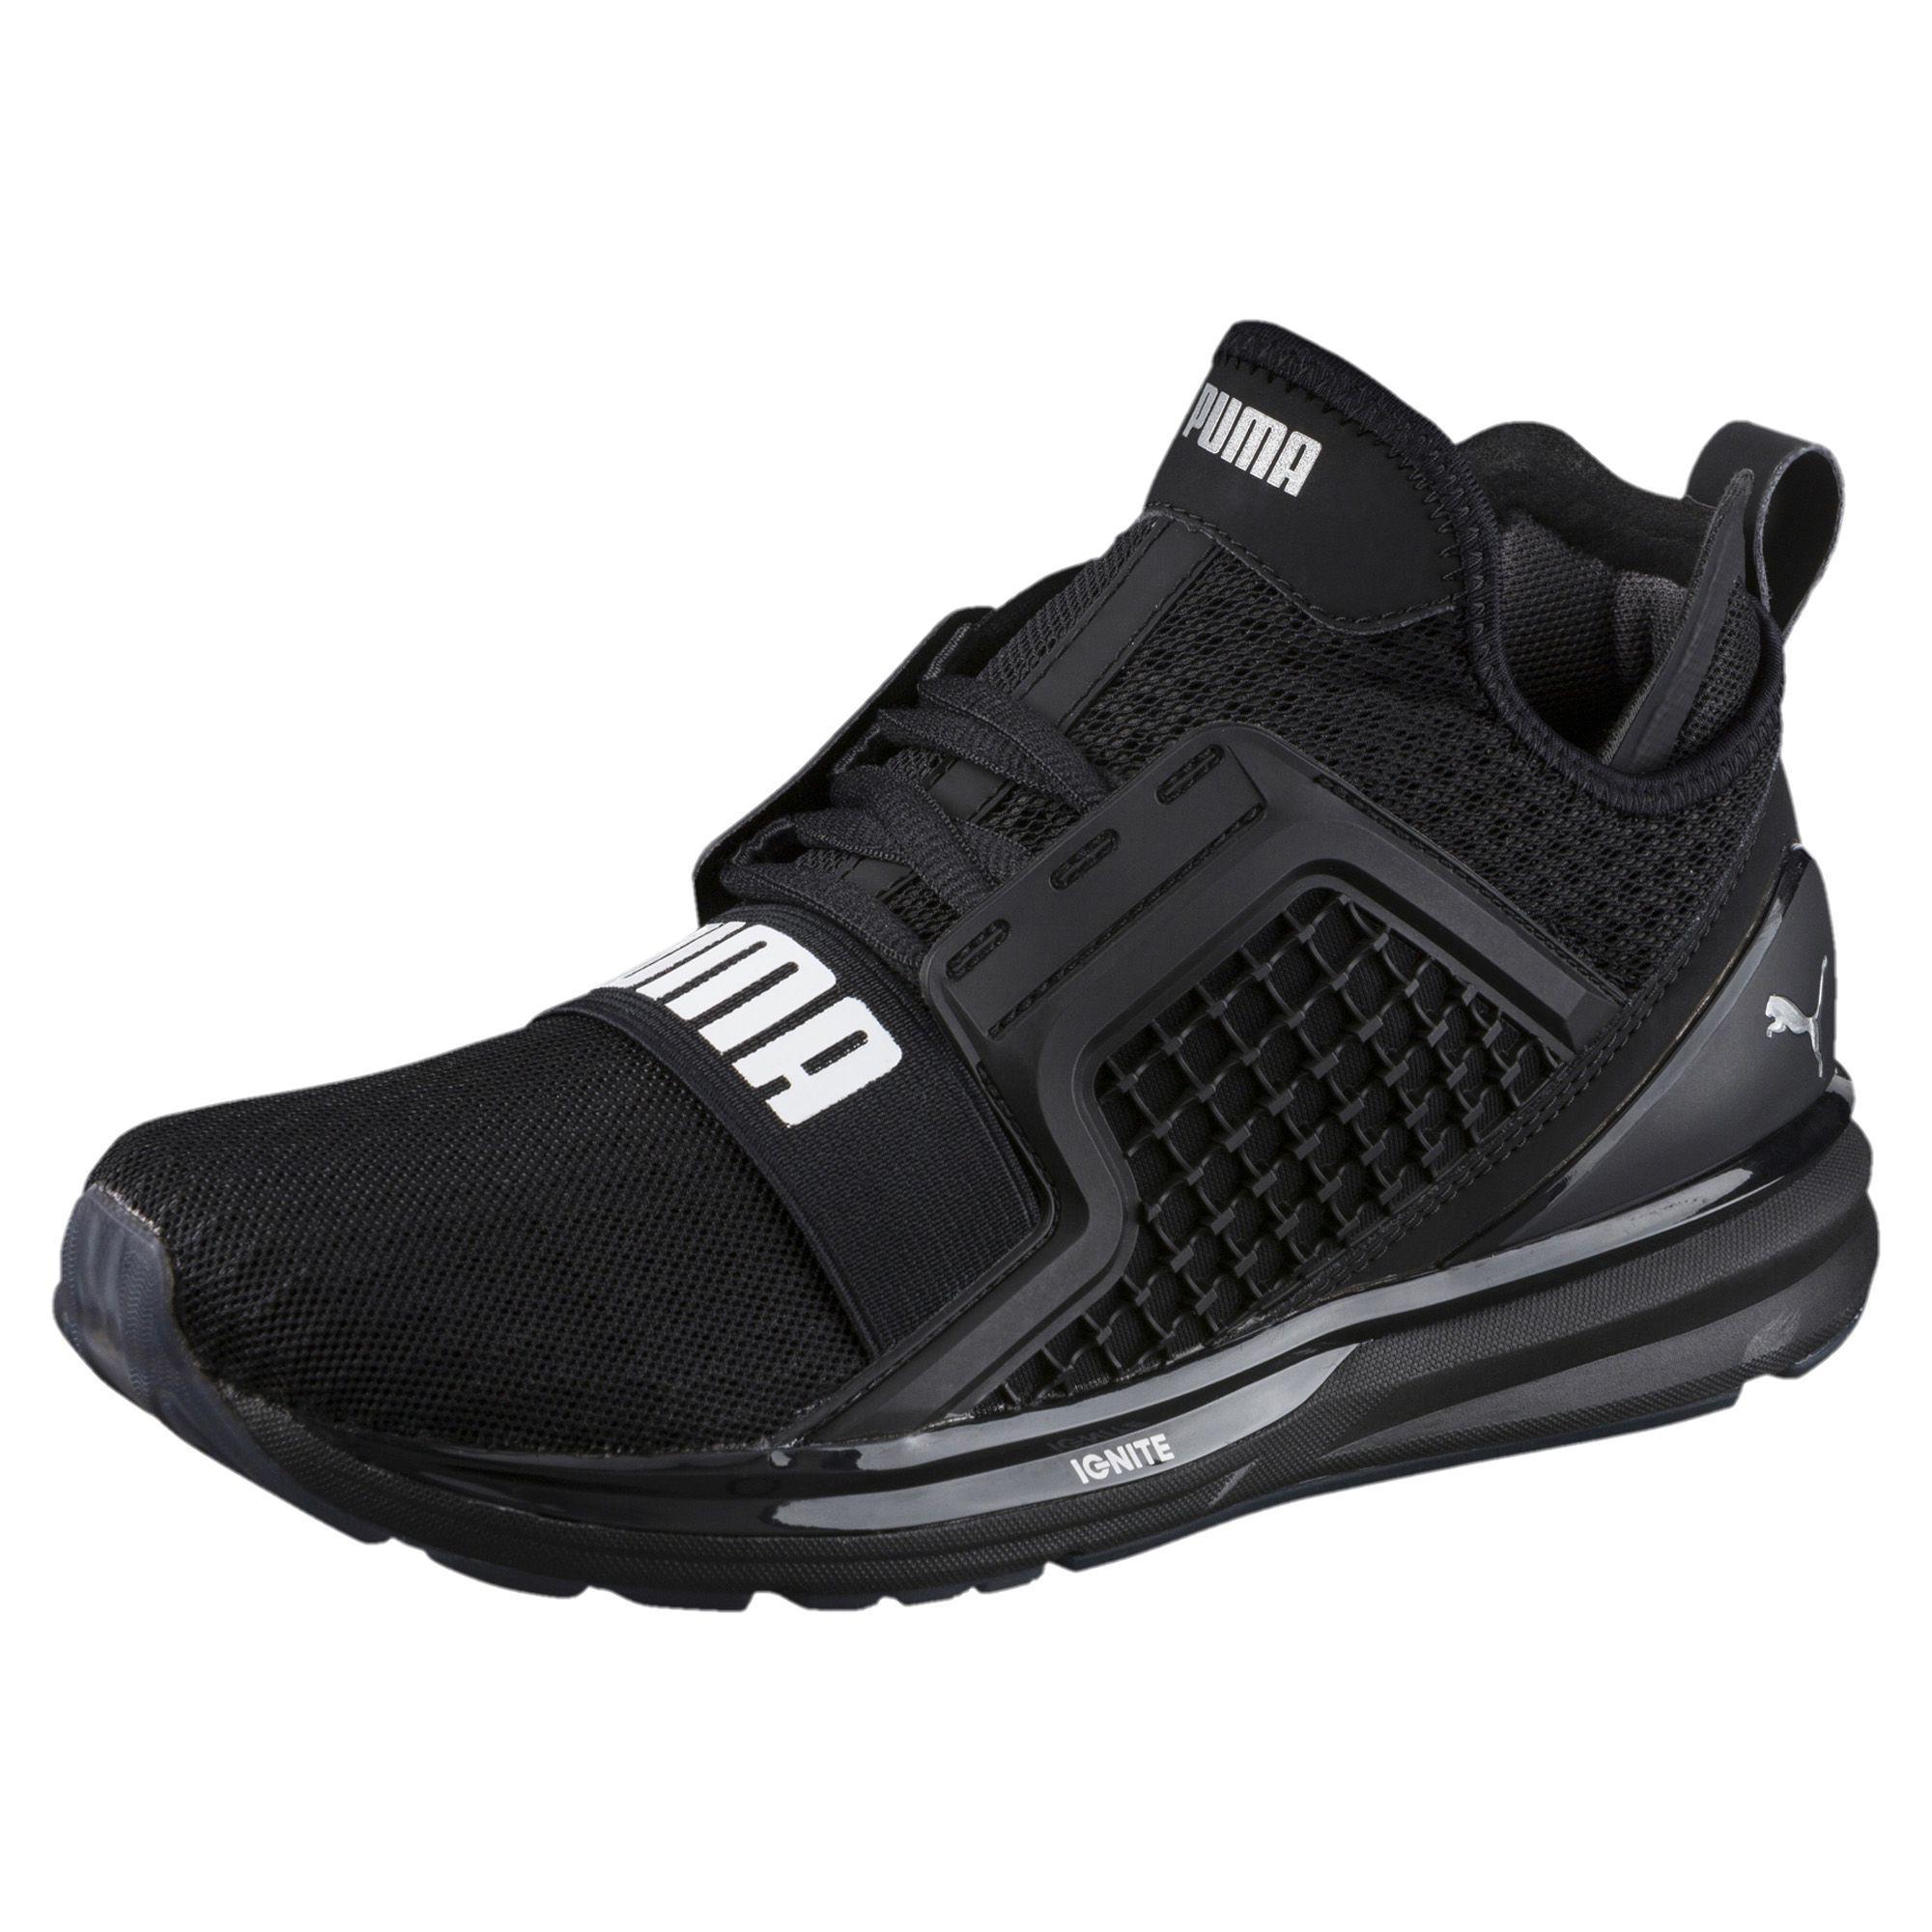 a89891be1f9af PUMA Black Ignite Limitless Women's Training Shoes